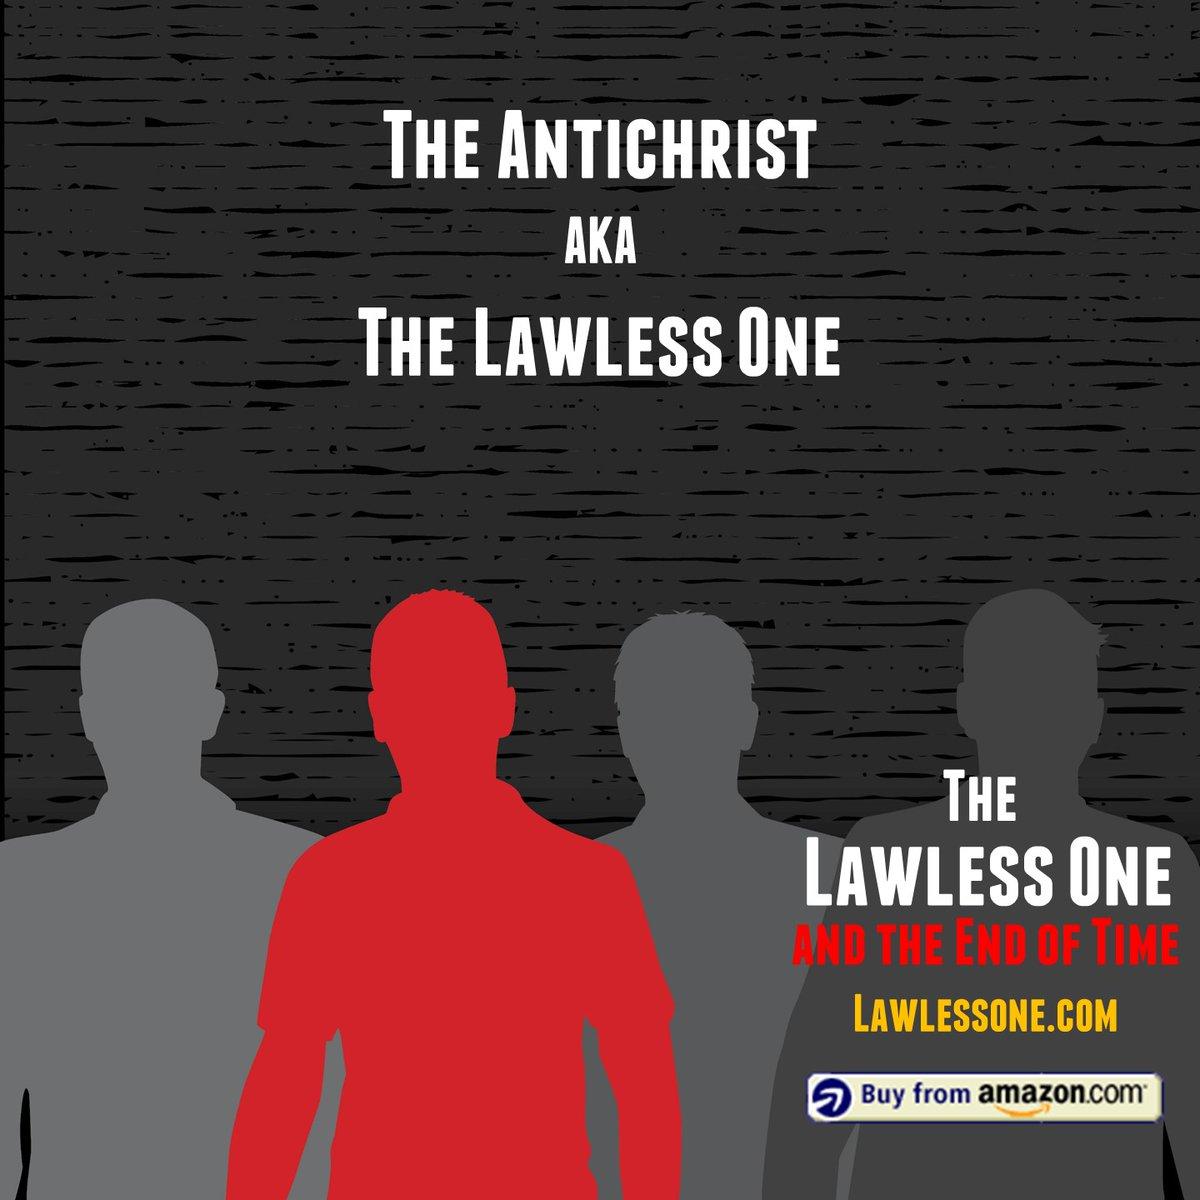 The Antichrist AKA The Lawless One #ad #antichrist #endtimes #armageddon #christianfiction #jesushttps://amzn.to/31A8gwv